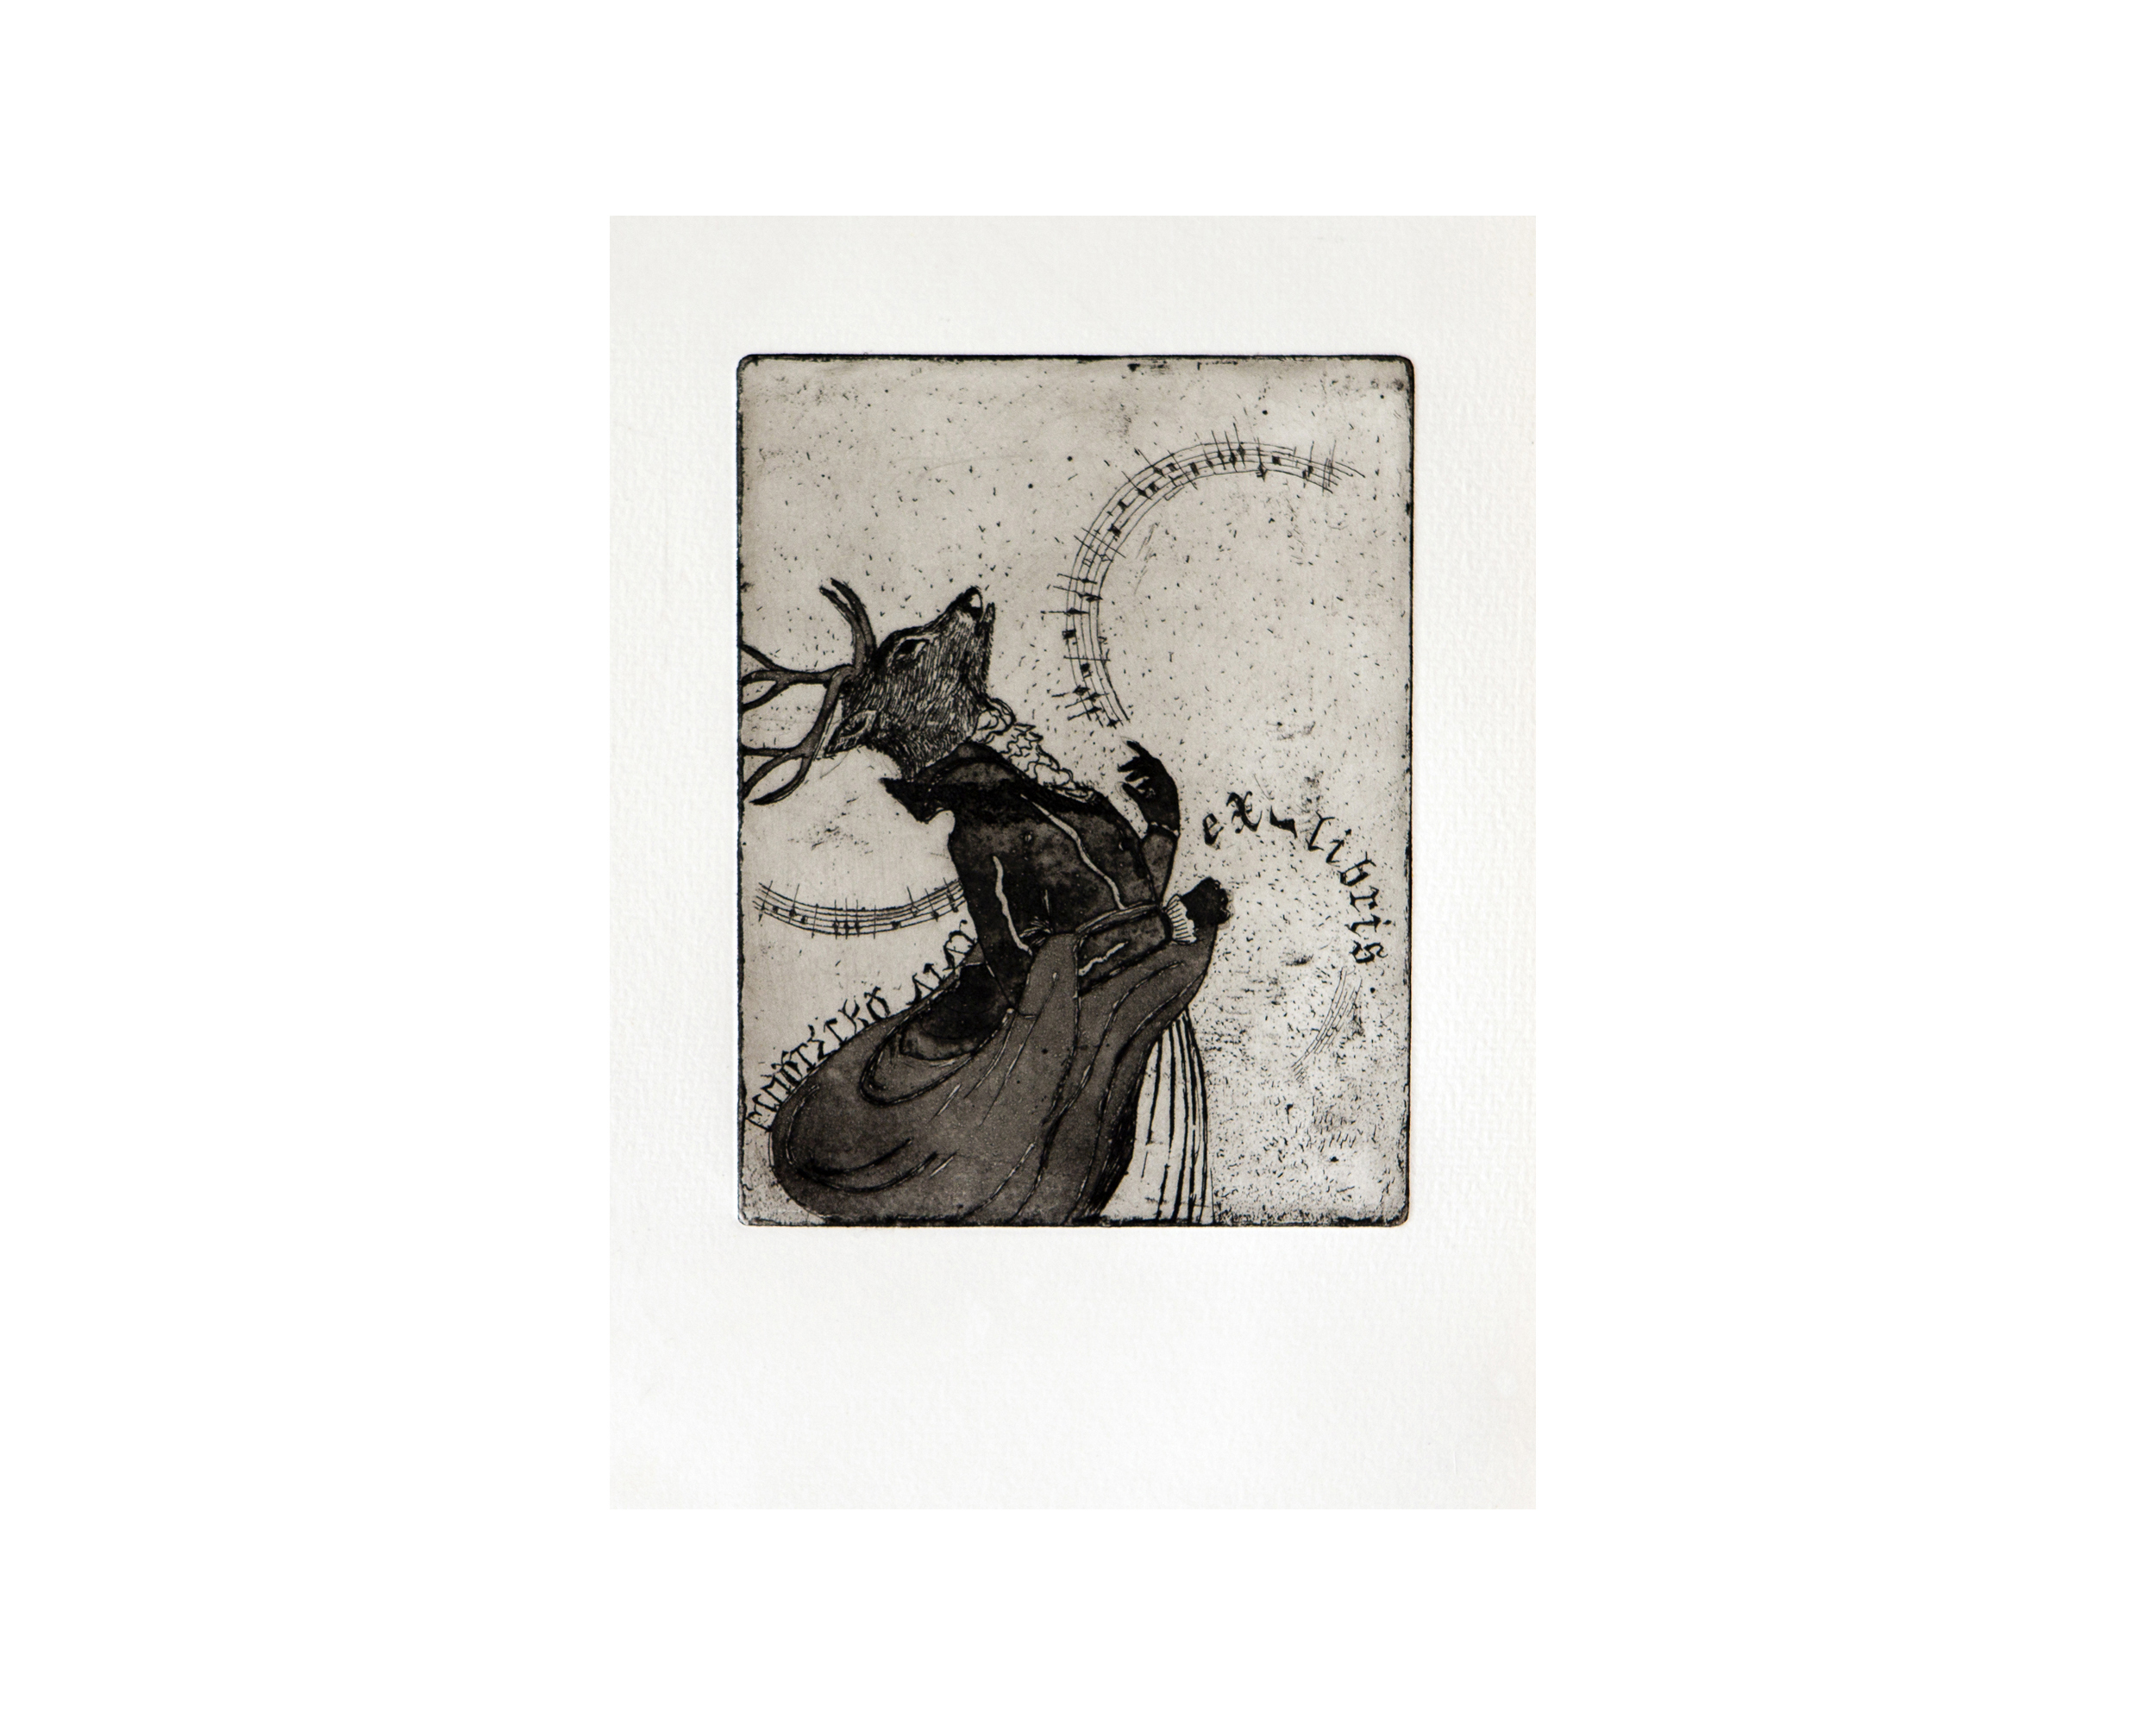 Ex Libris, limited edition etching print, aquatint, eau forte 10 x 13 cm 2008